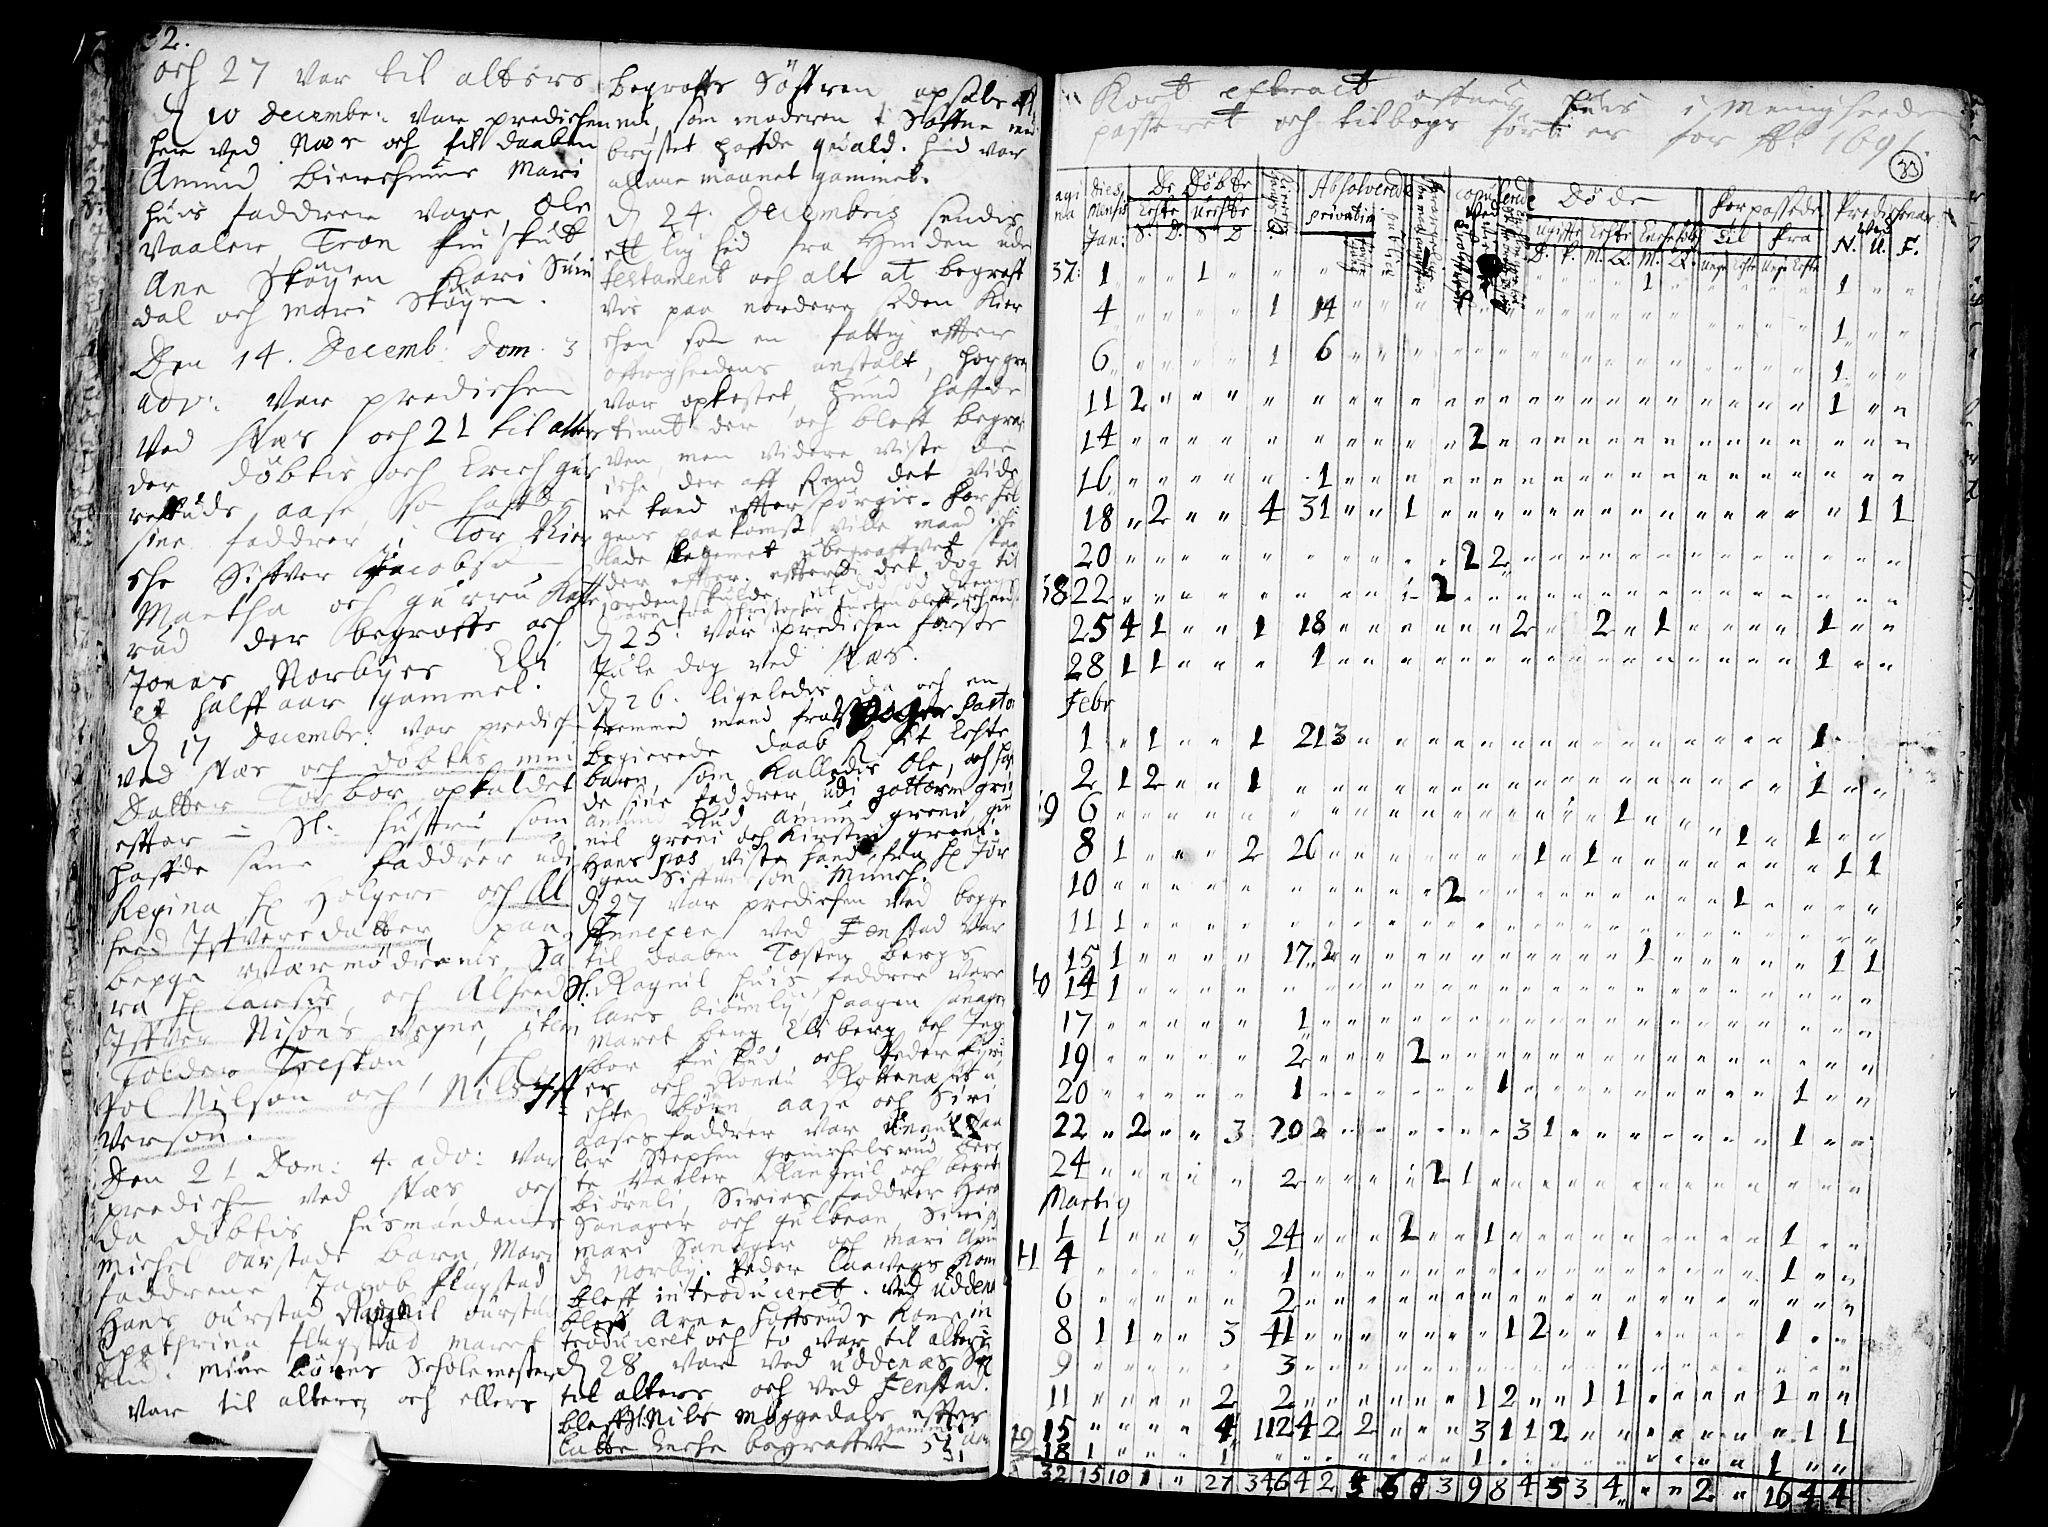 SAO, Nes prestekontor Kirkebøker, F/Fa/L0001: Parish register (official) no. I 1, 1689-1716, p. 32-33